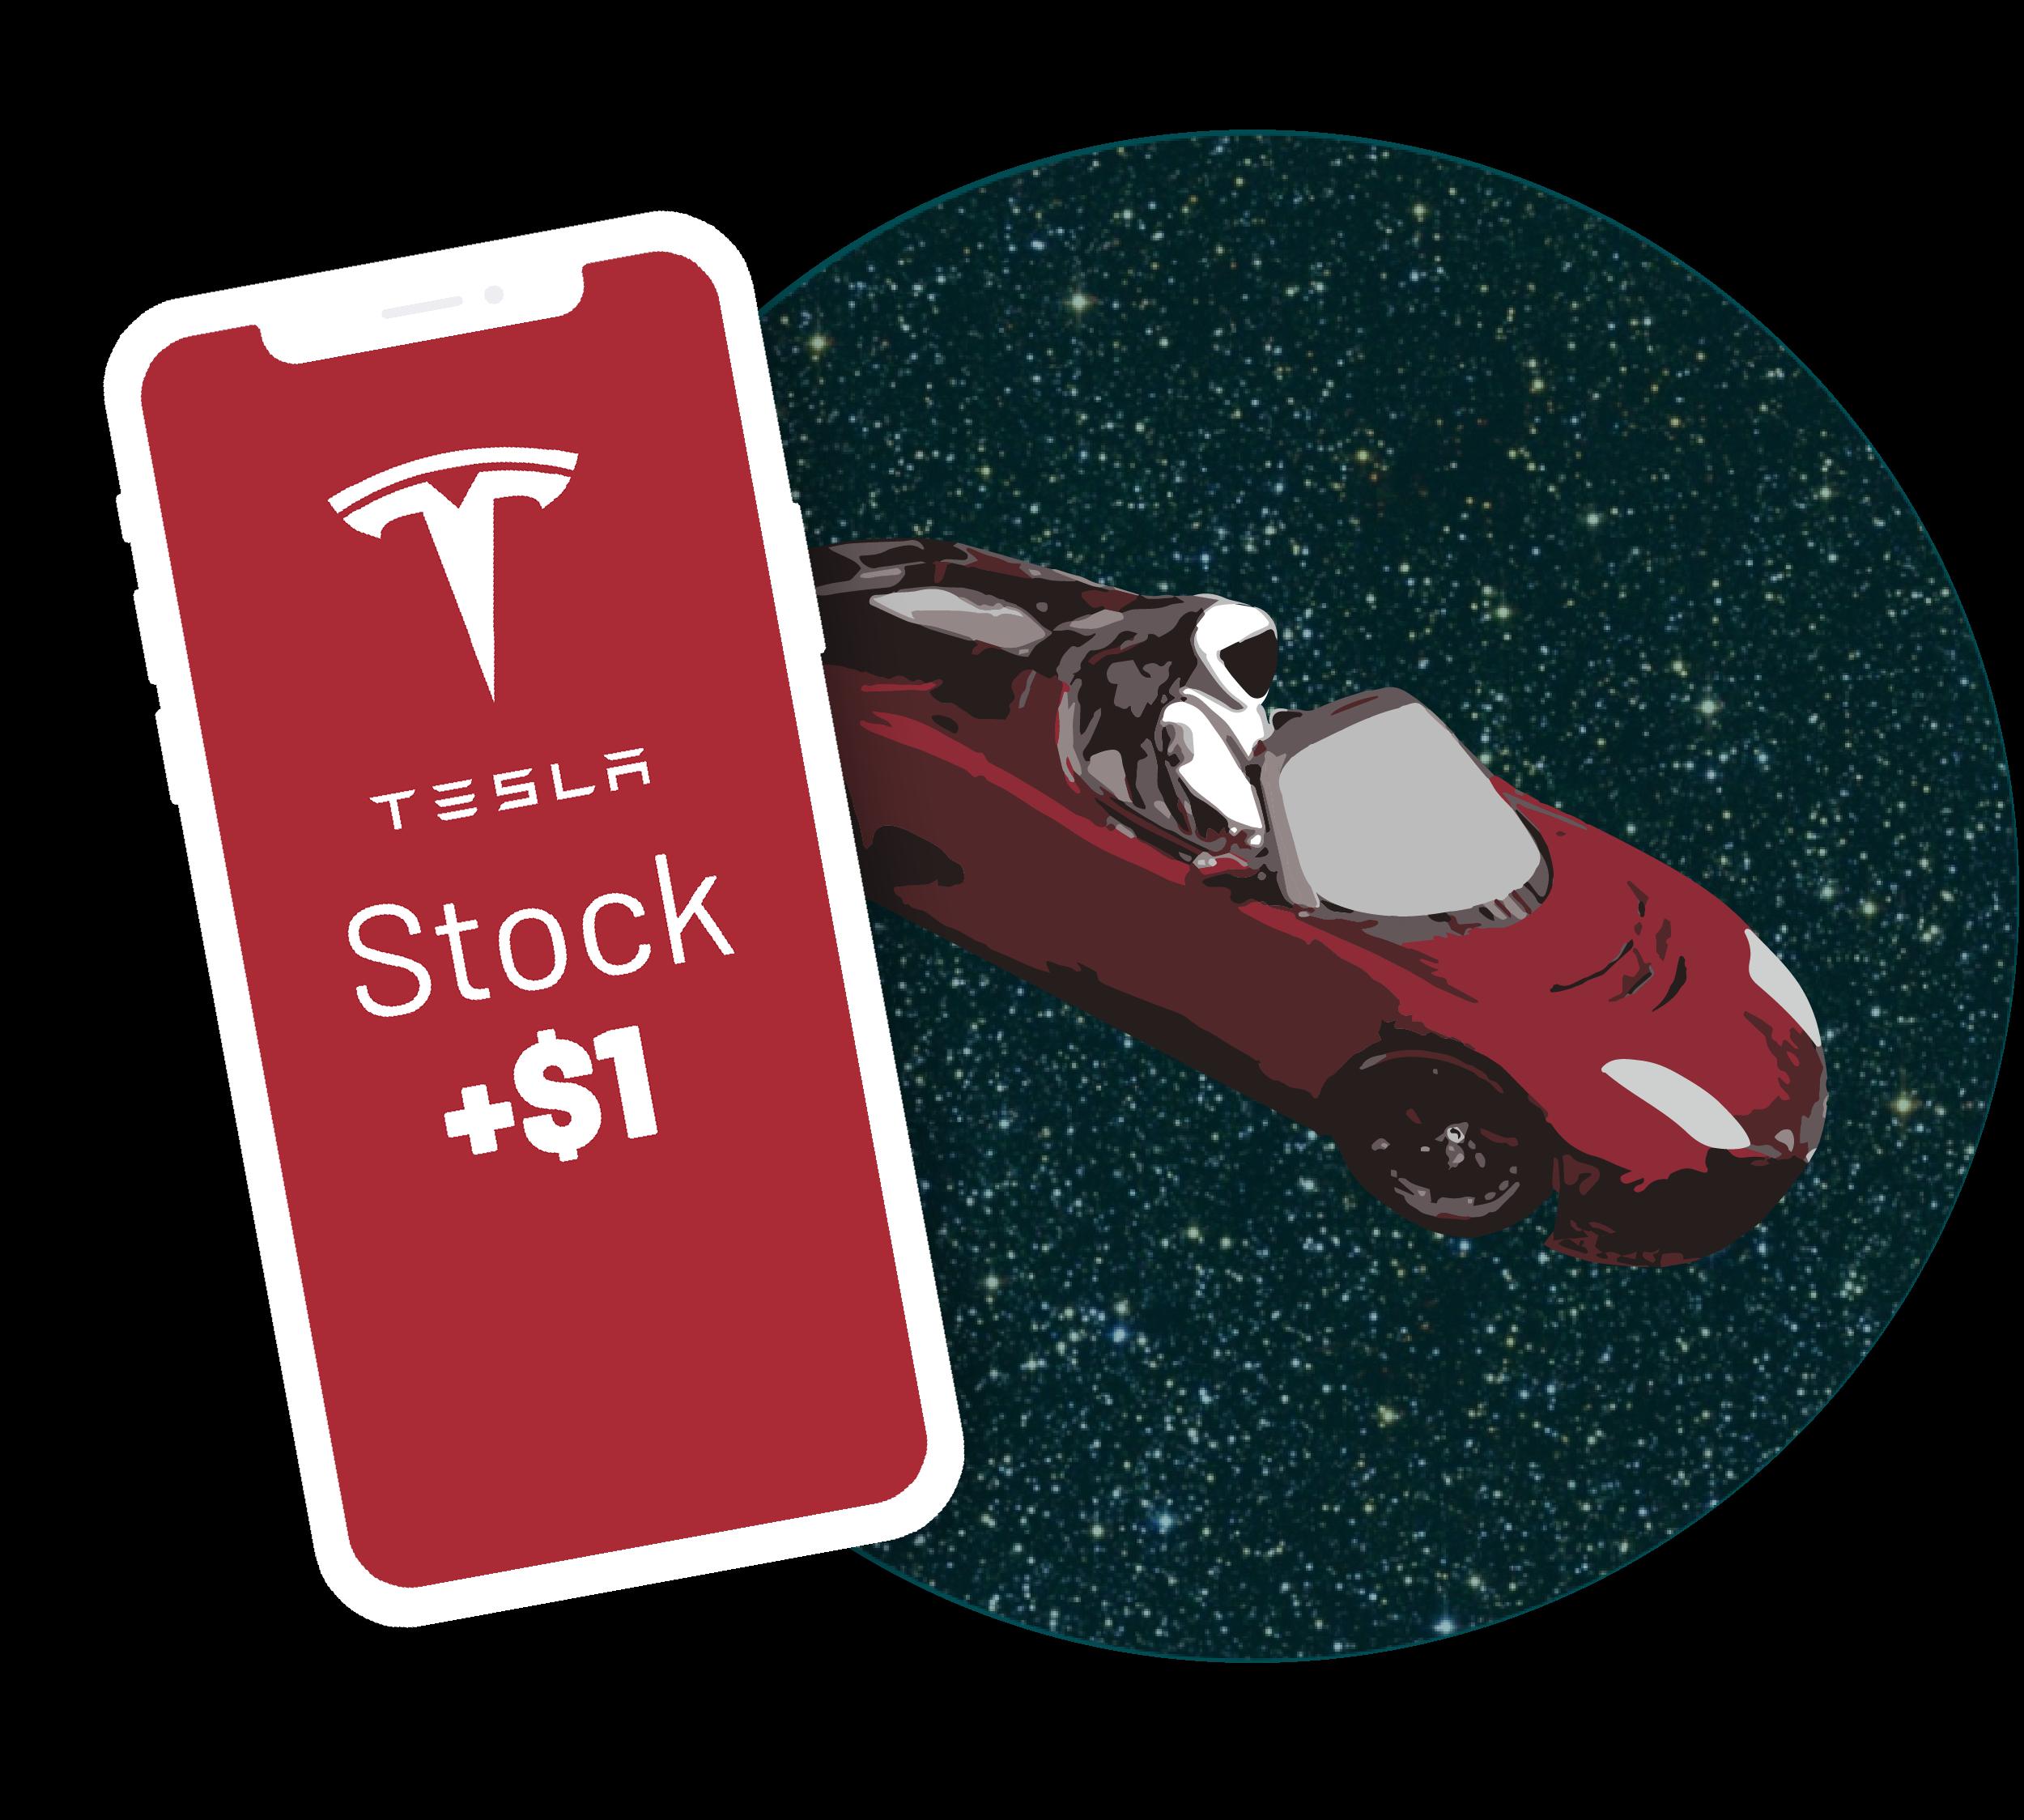 tesla_grifin_invest_save_$1up_roundup.png